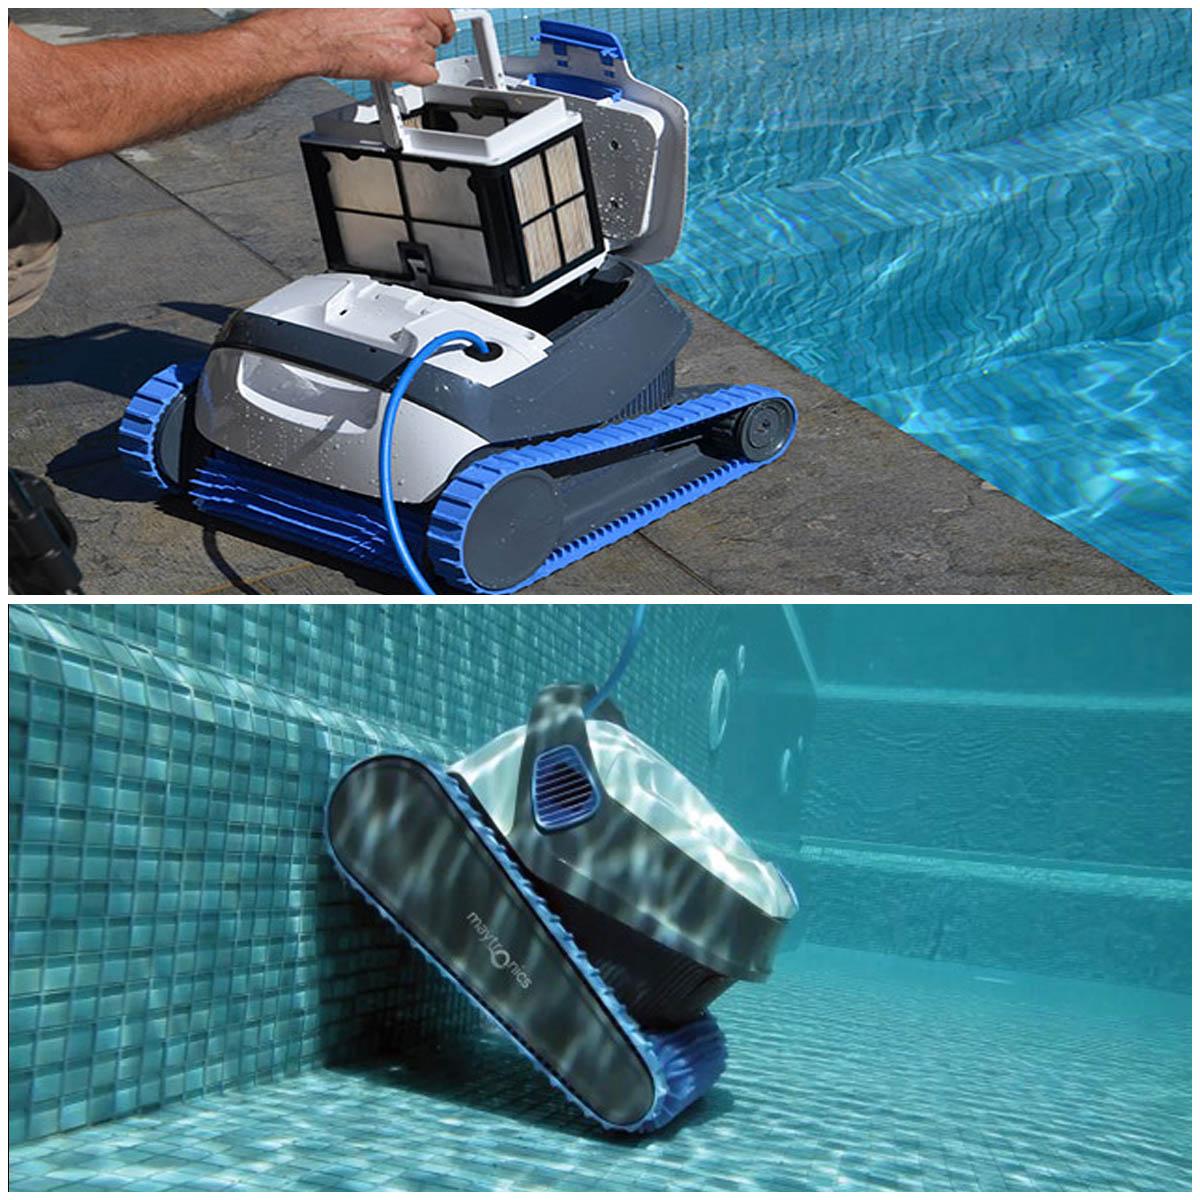 Робот для бассейна Dolphin S200-6